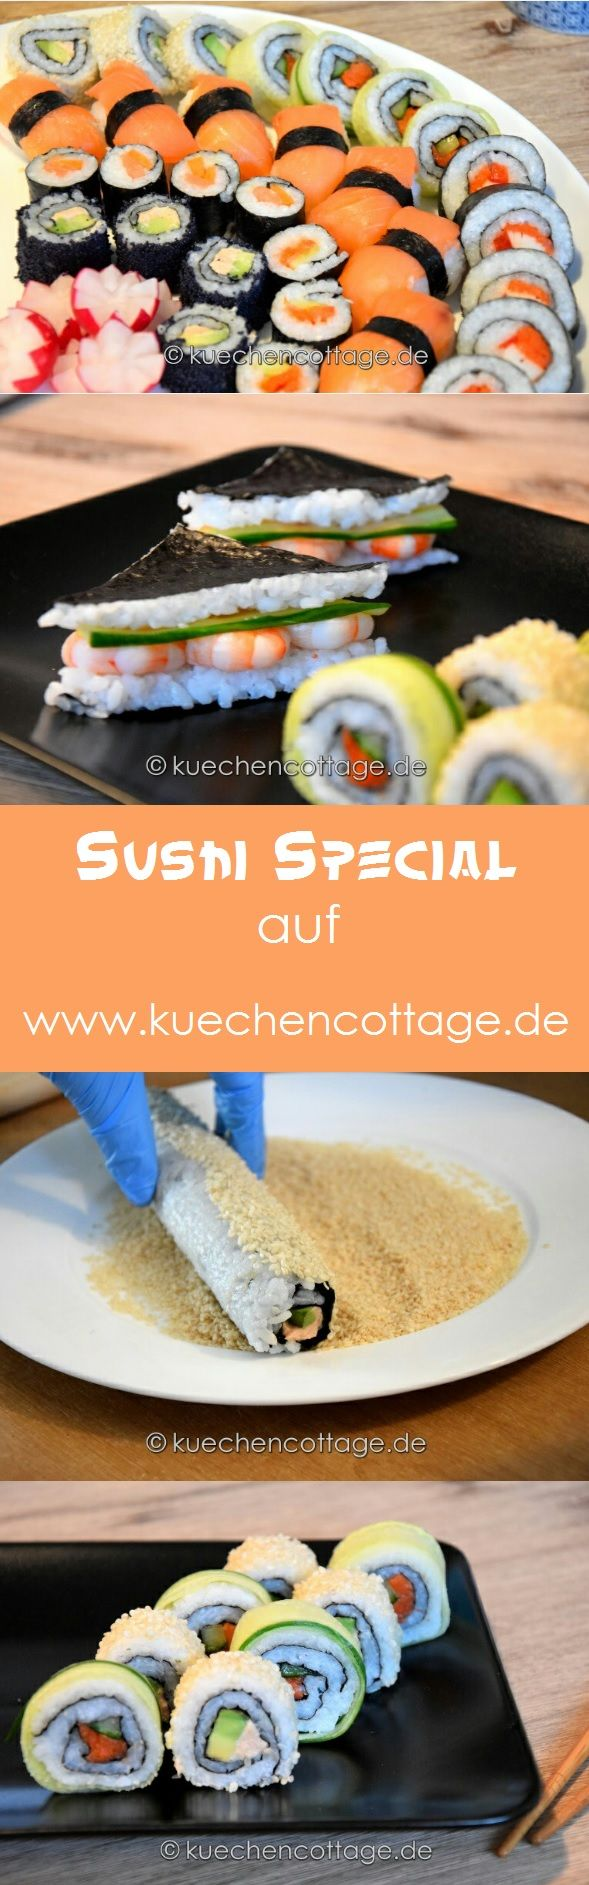 Großes Sushi Special + Video | Küchencottage…